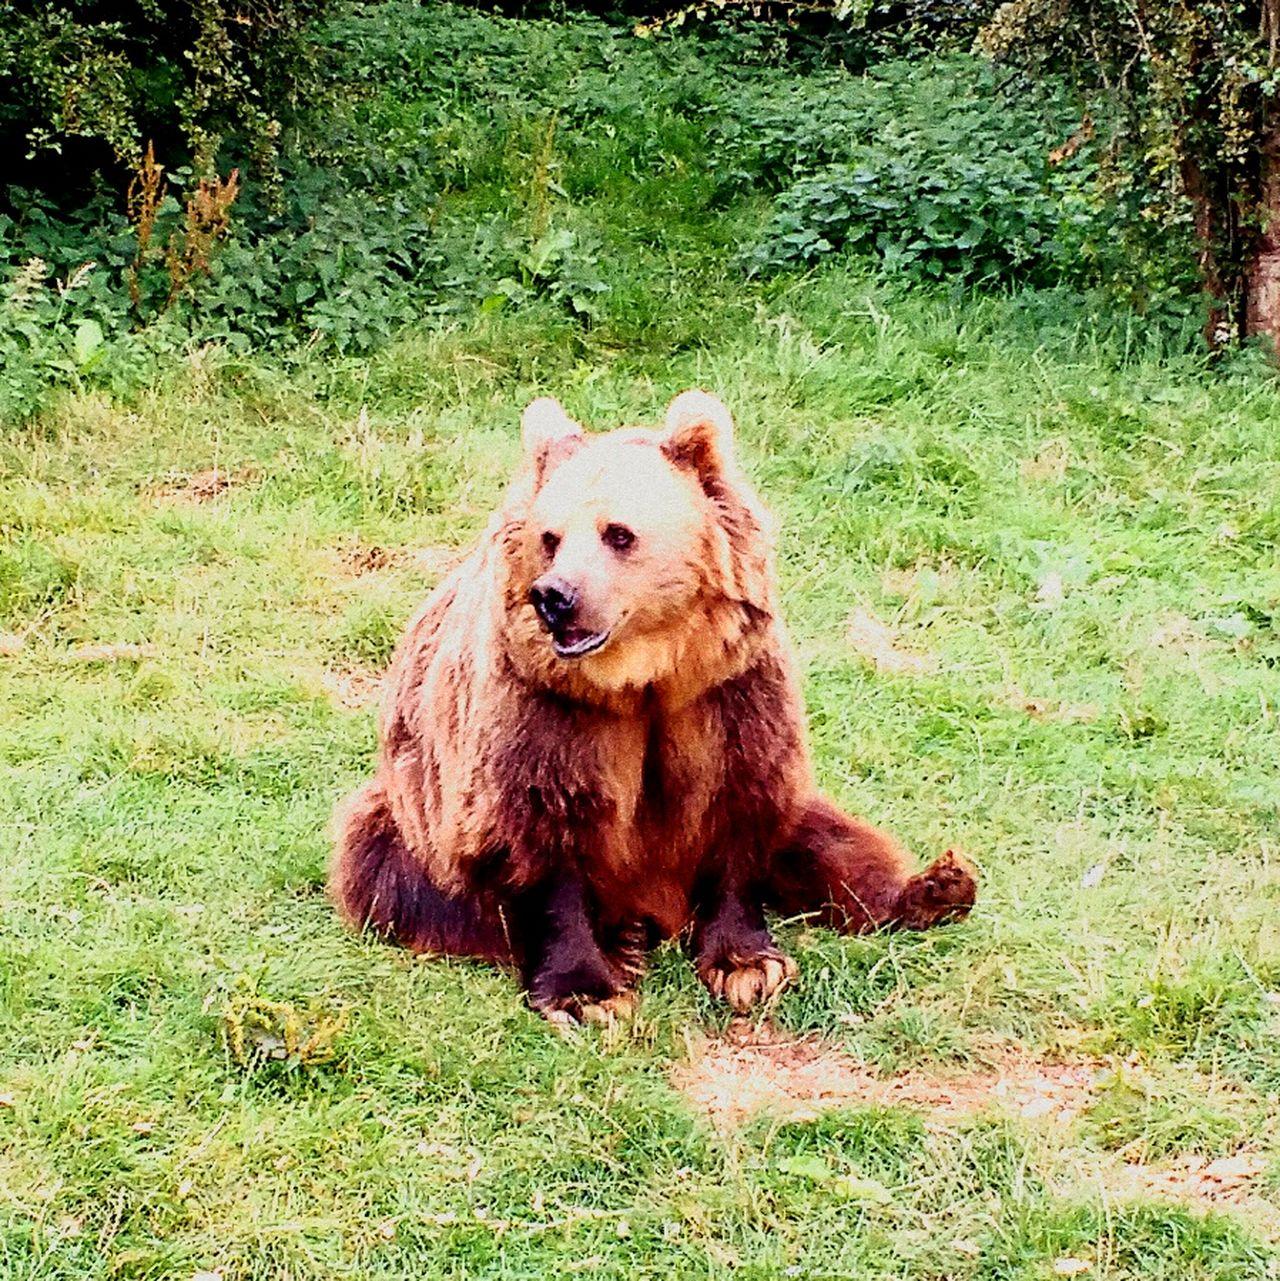 Bear Brown Bear Wildanimal Wild Animal Wild Animals Up Close Bears Galore Bears Lovers Animal Animals In The Wild Wild Animal Photography Animal_collection Animal Wildlife Animal Portrait Wild Animals Close Up Bears Animal Photography